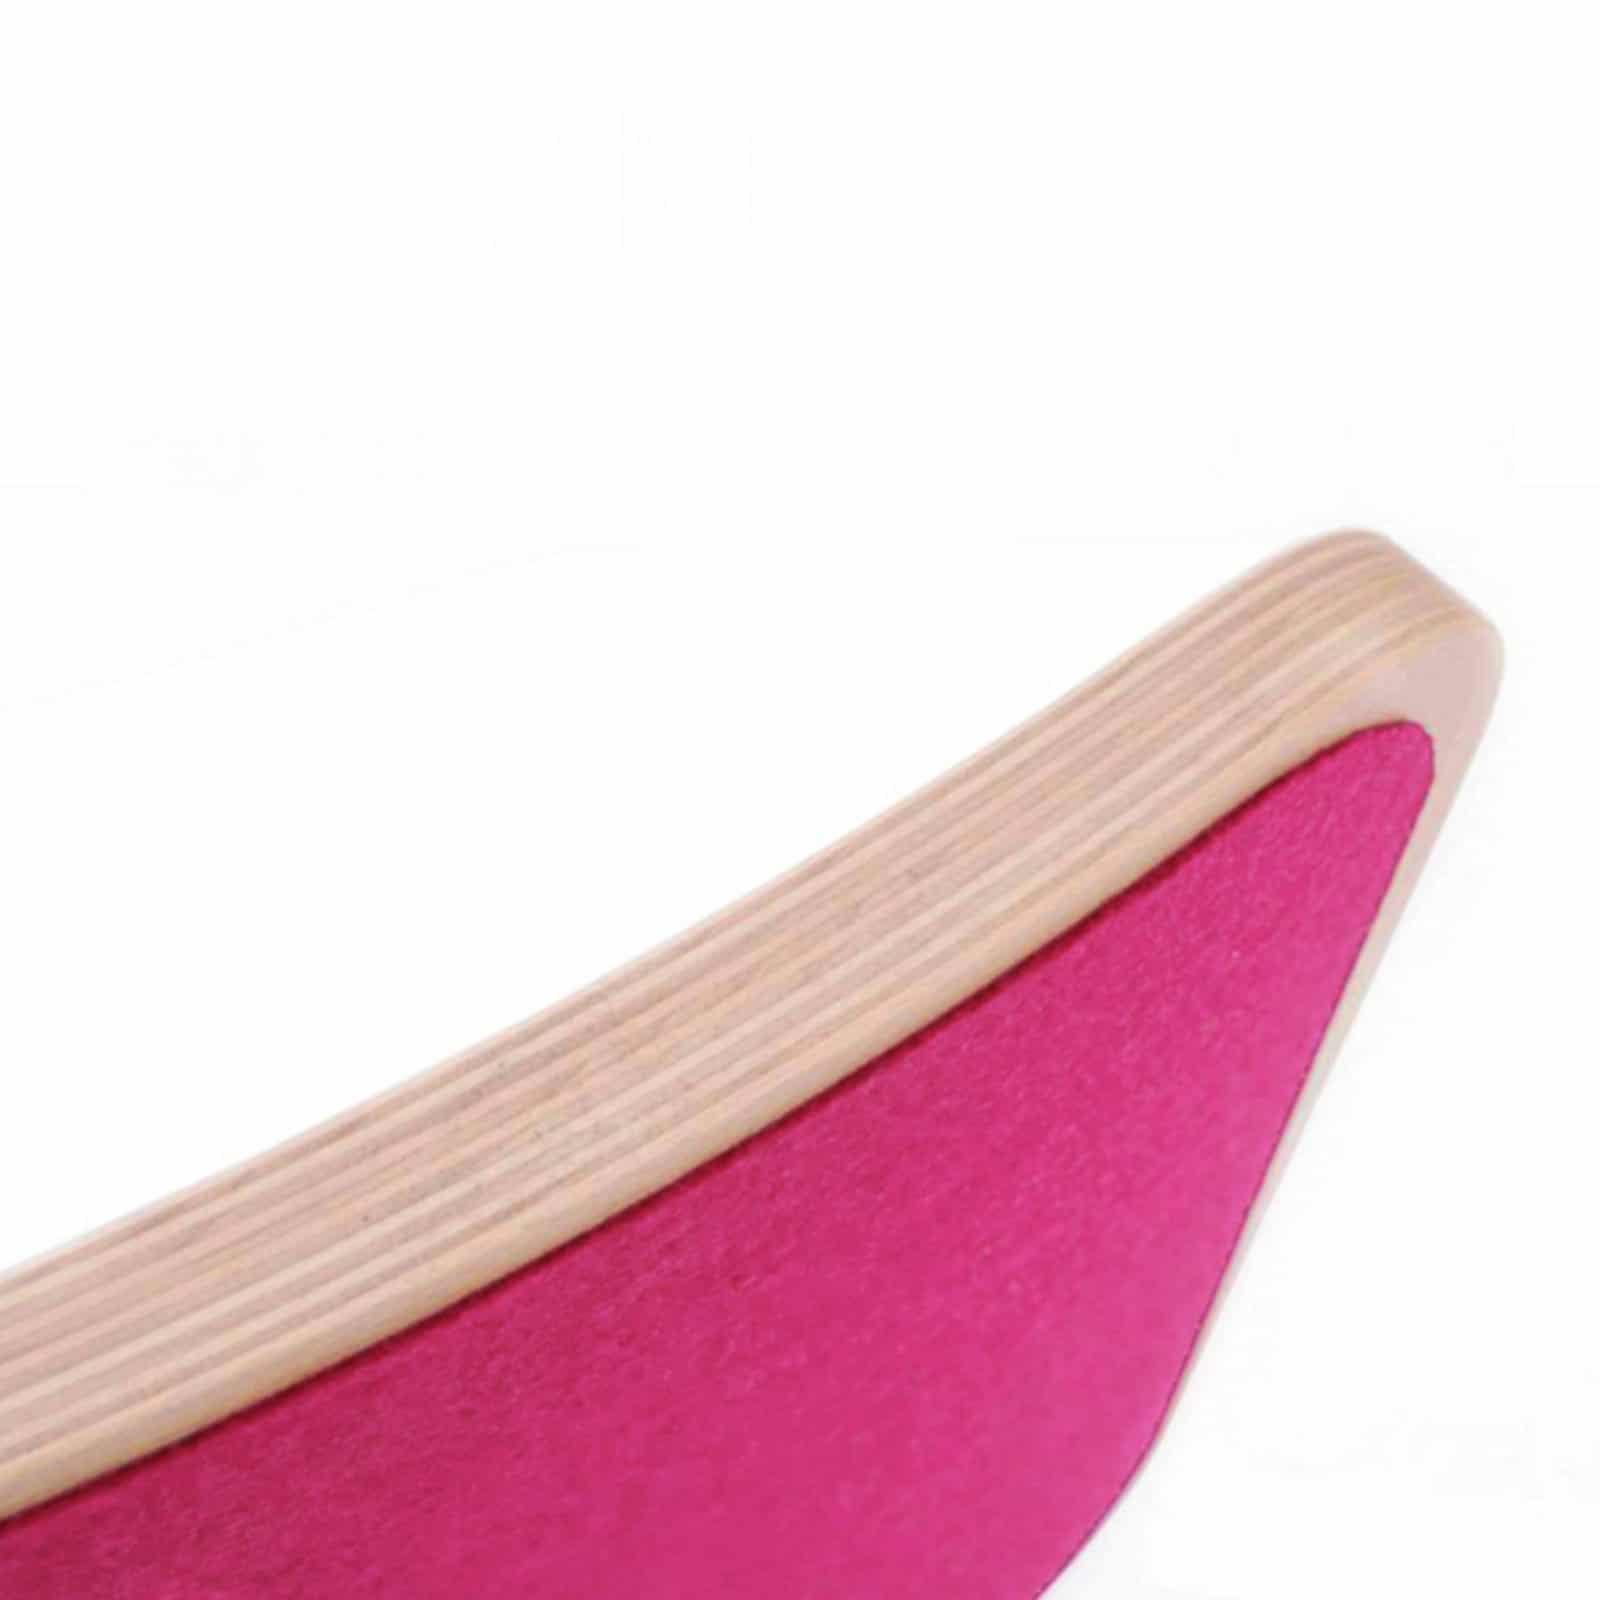 Balance Board Melbourne: Wobbel Wooden Balance Board With Felt Raspberry